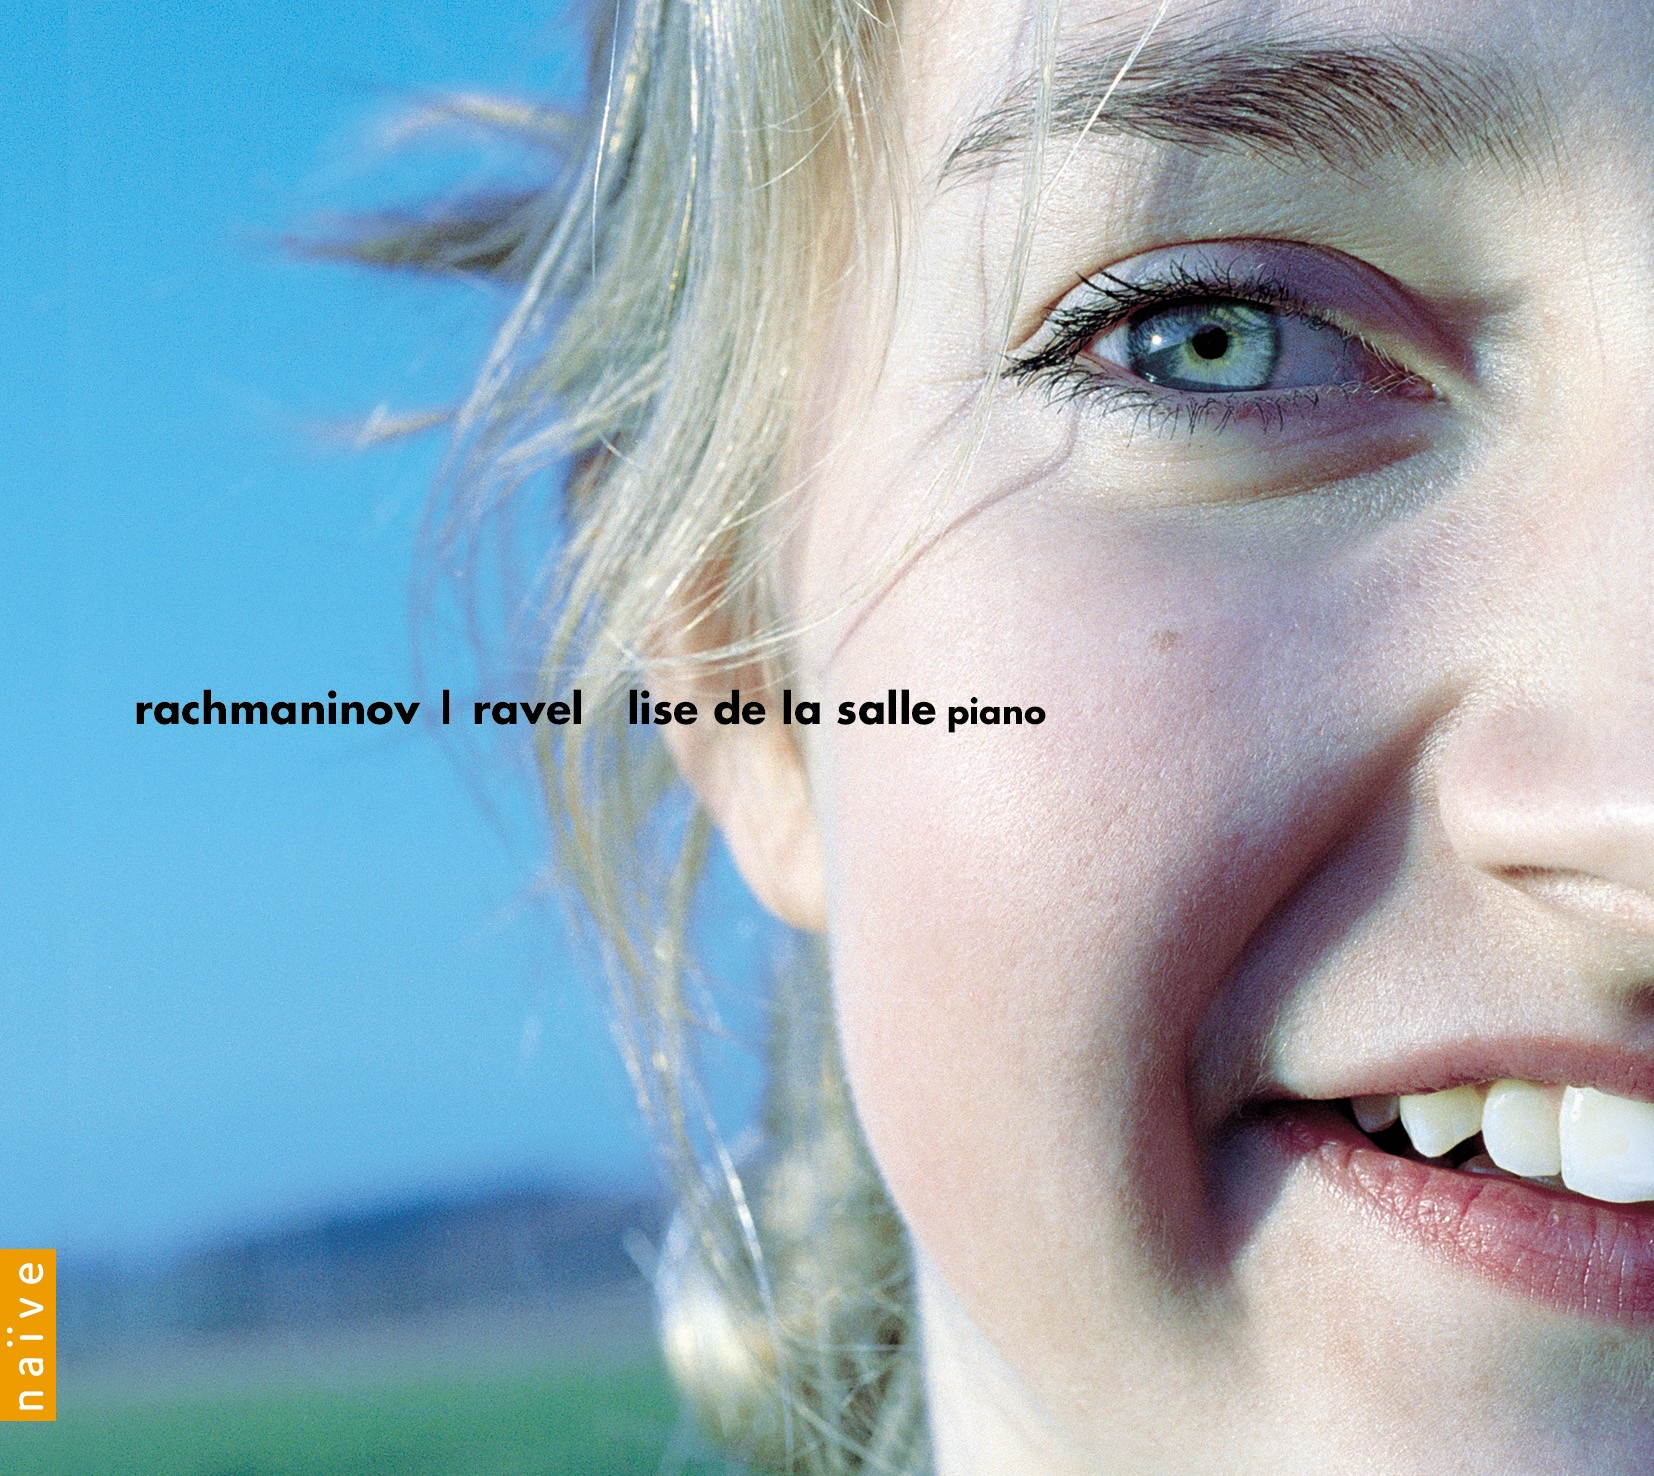 Rachmaninoff / Ravel (2003)